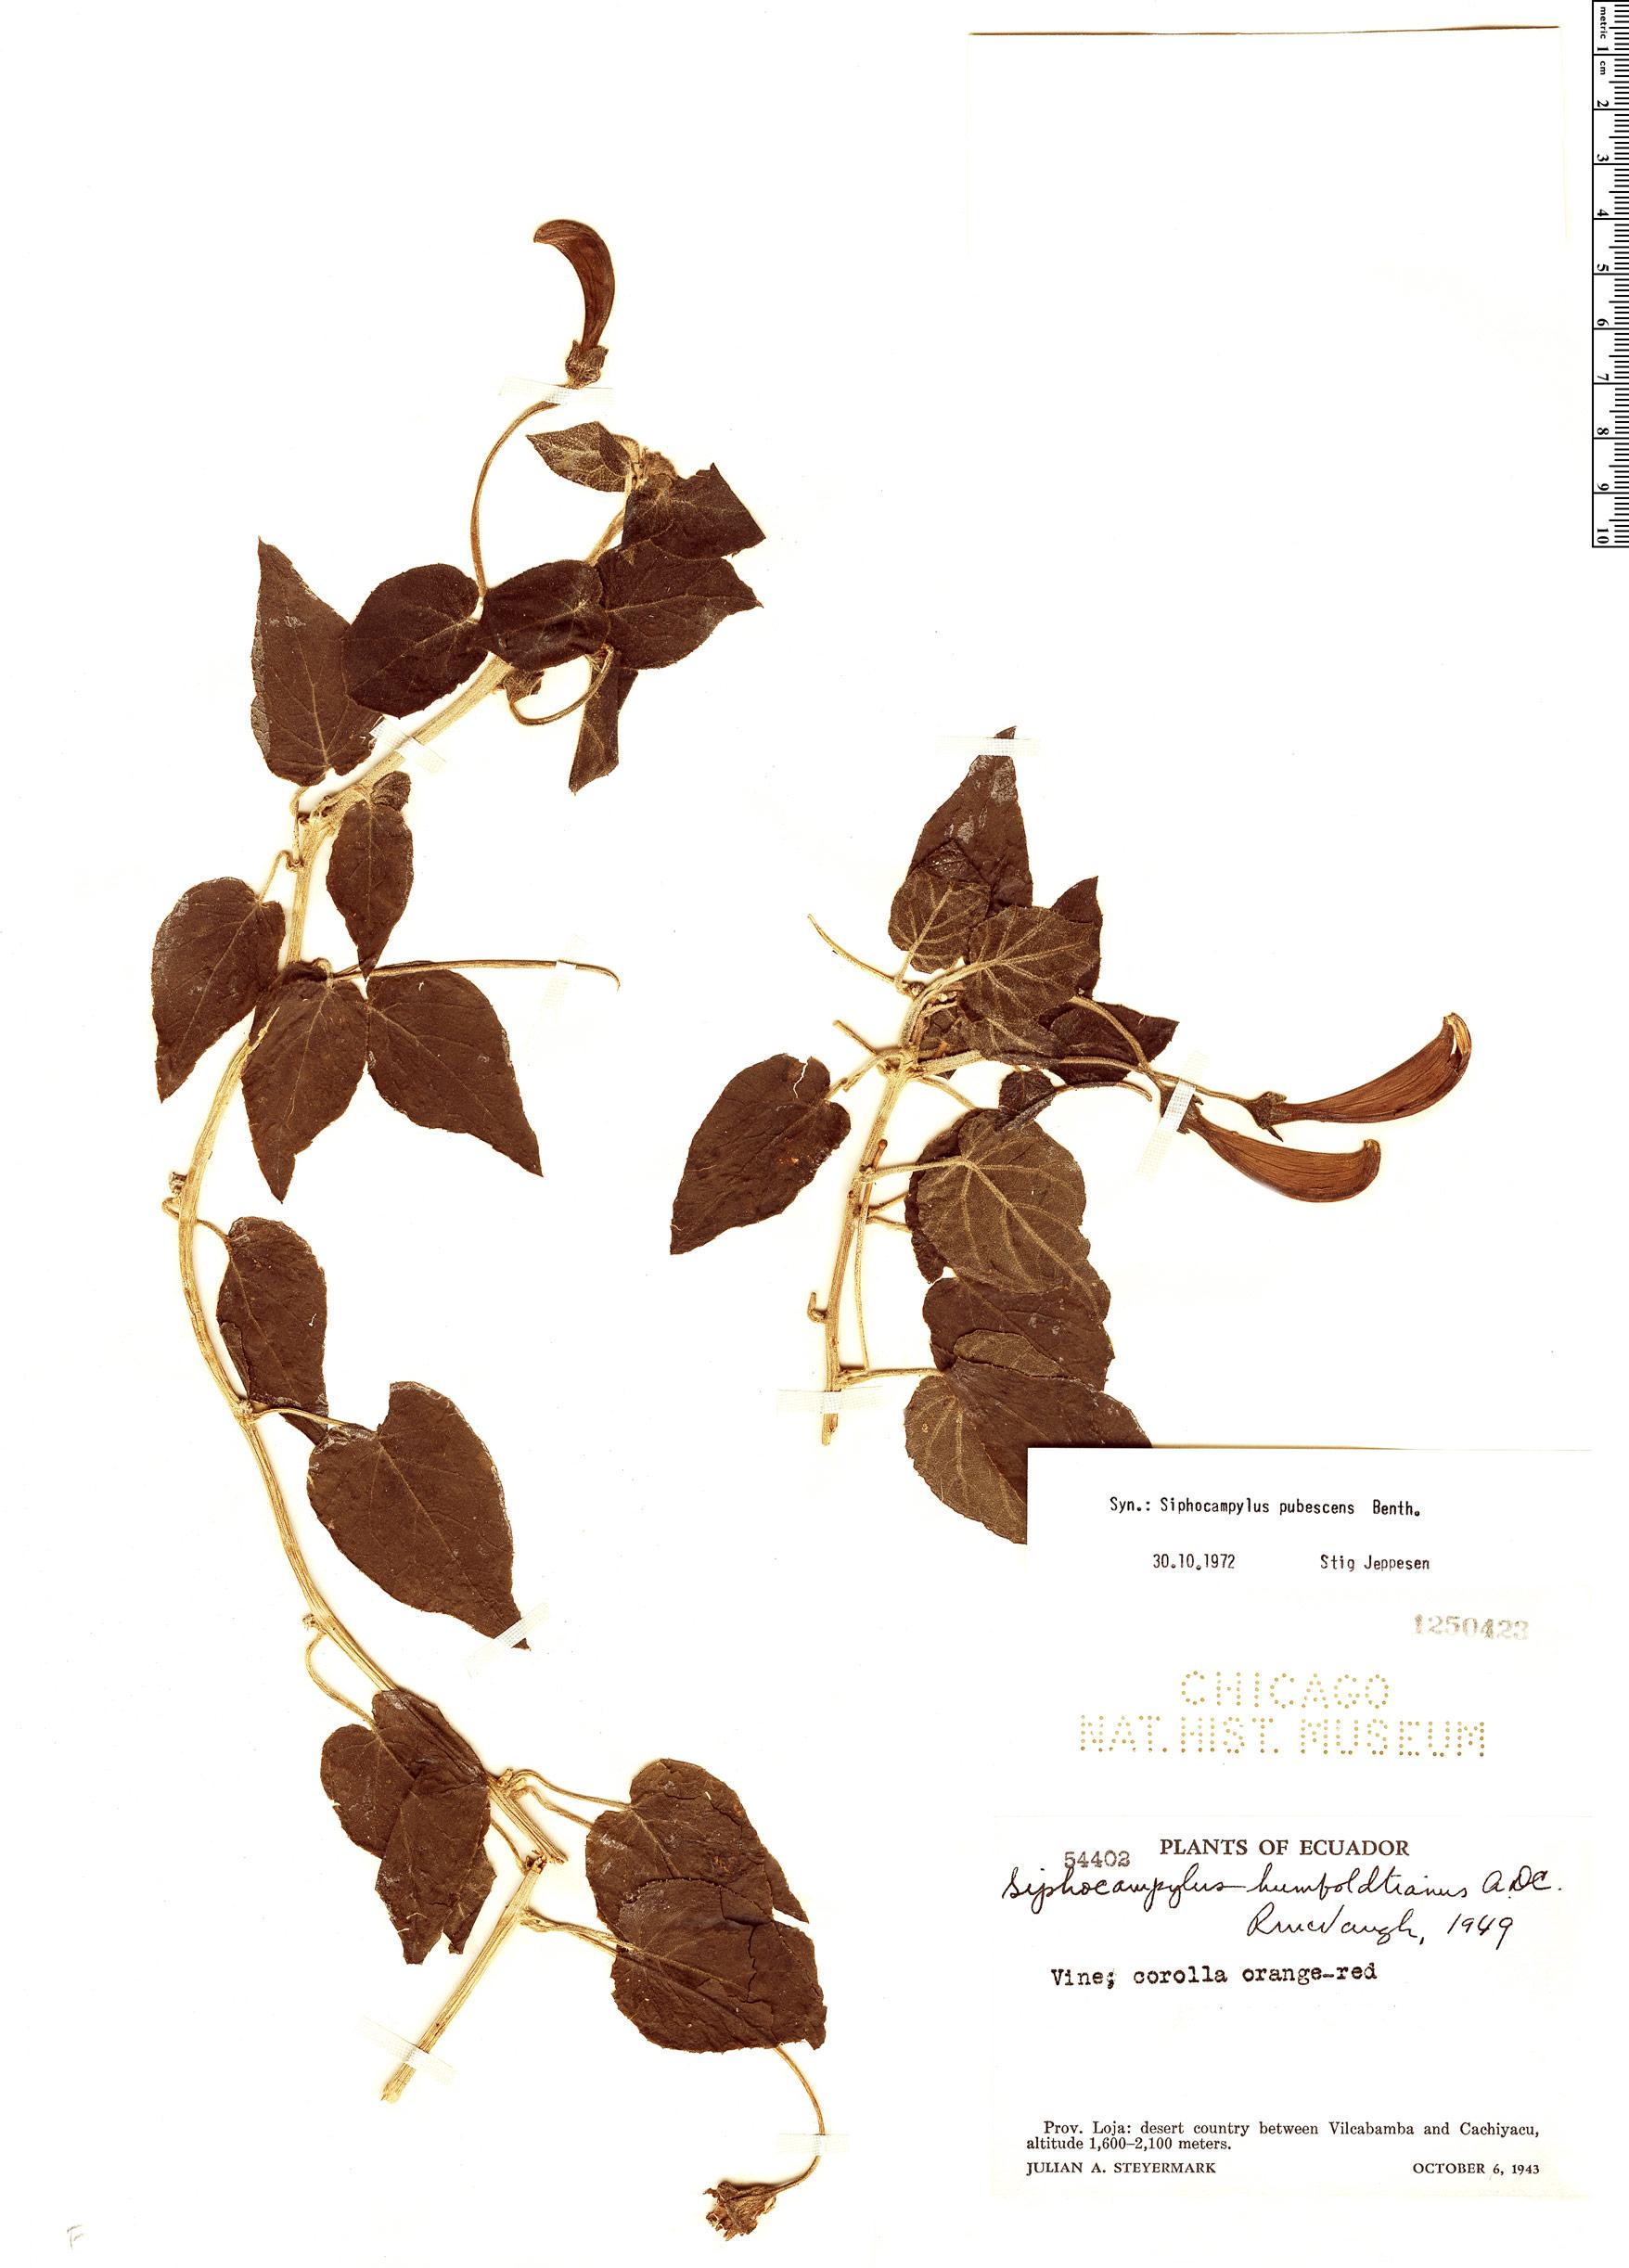 Specimen: Siphocampylus pubescens